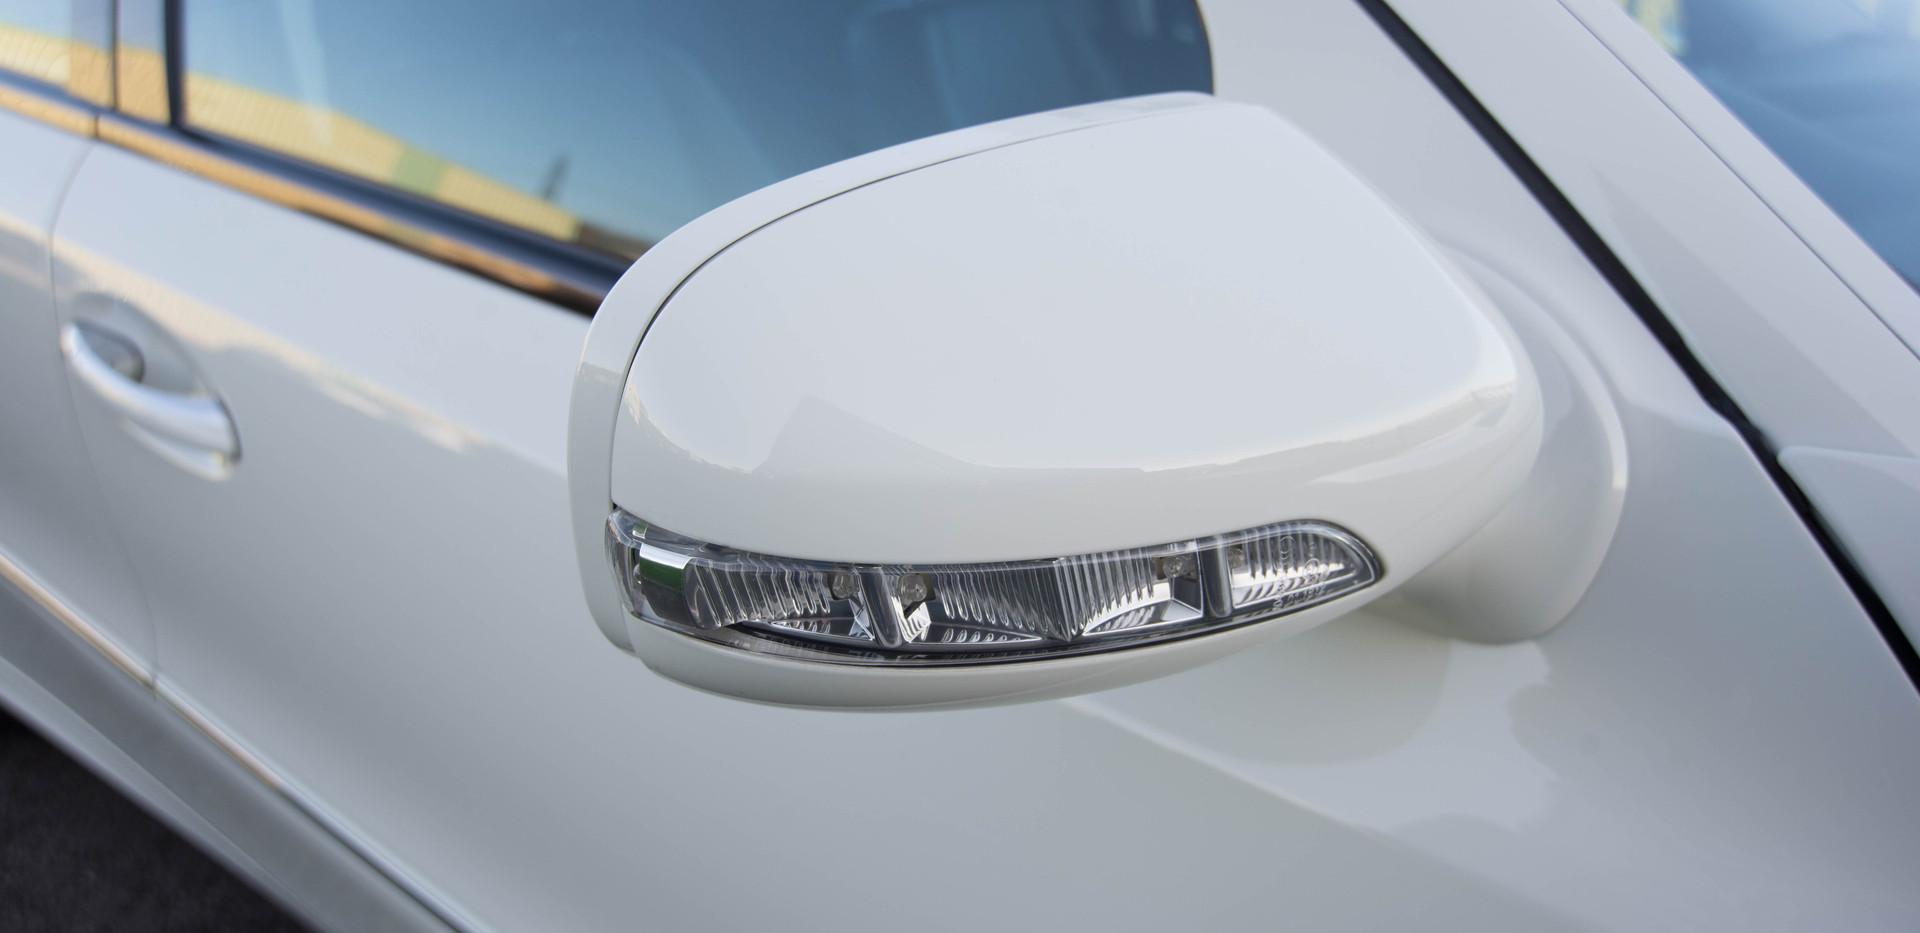 Mercedes E350 For Sale UK London  (30 of